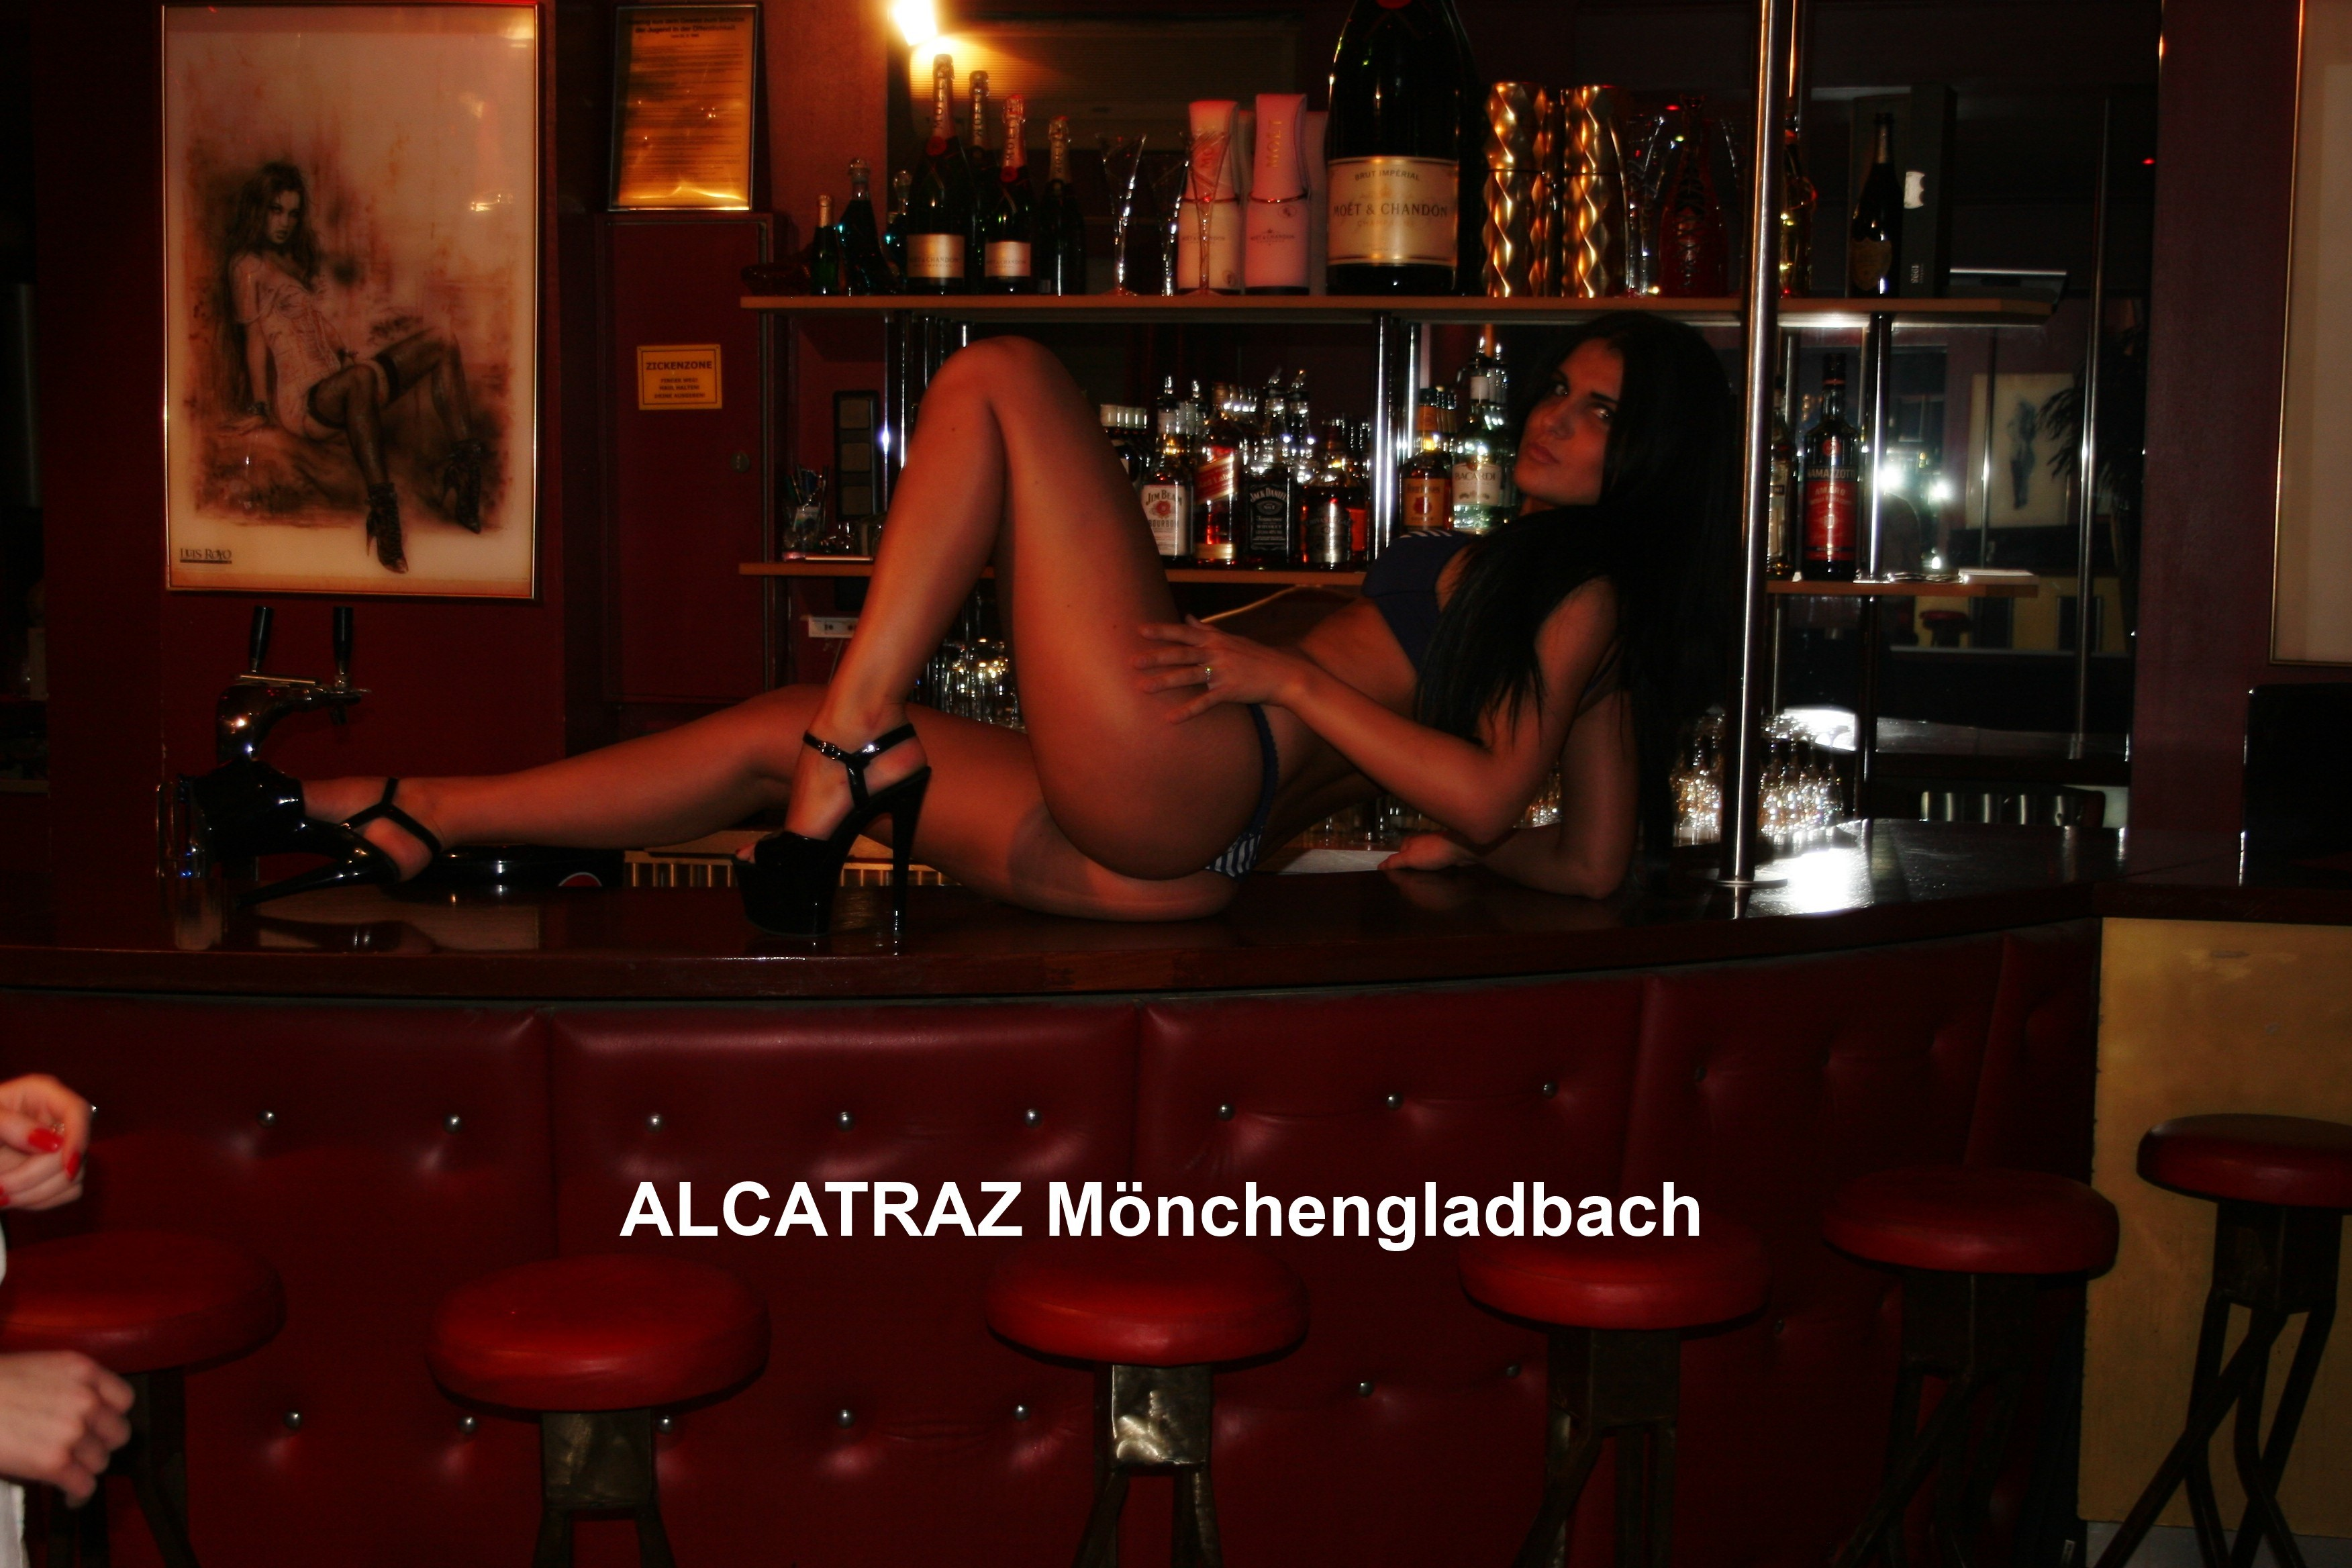 Sextreffen regensburg strip club zagreb